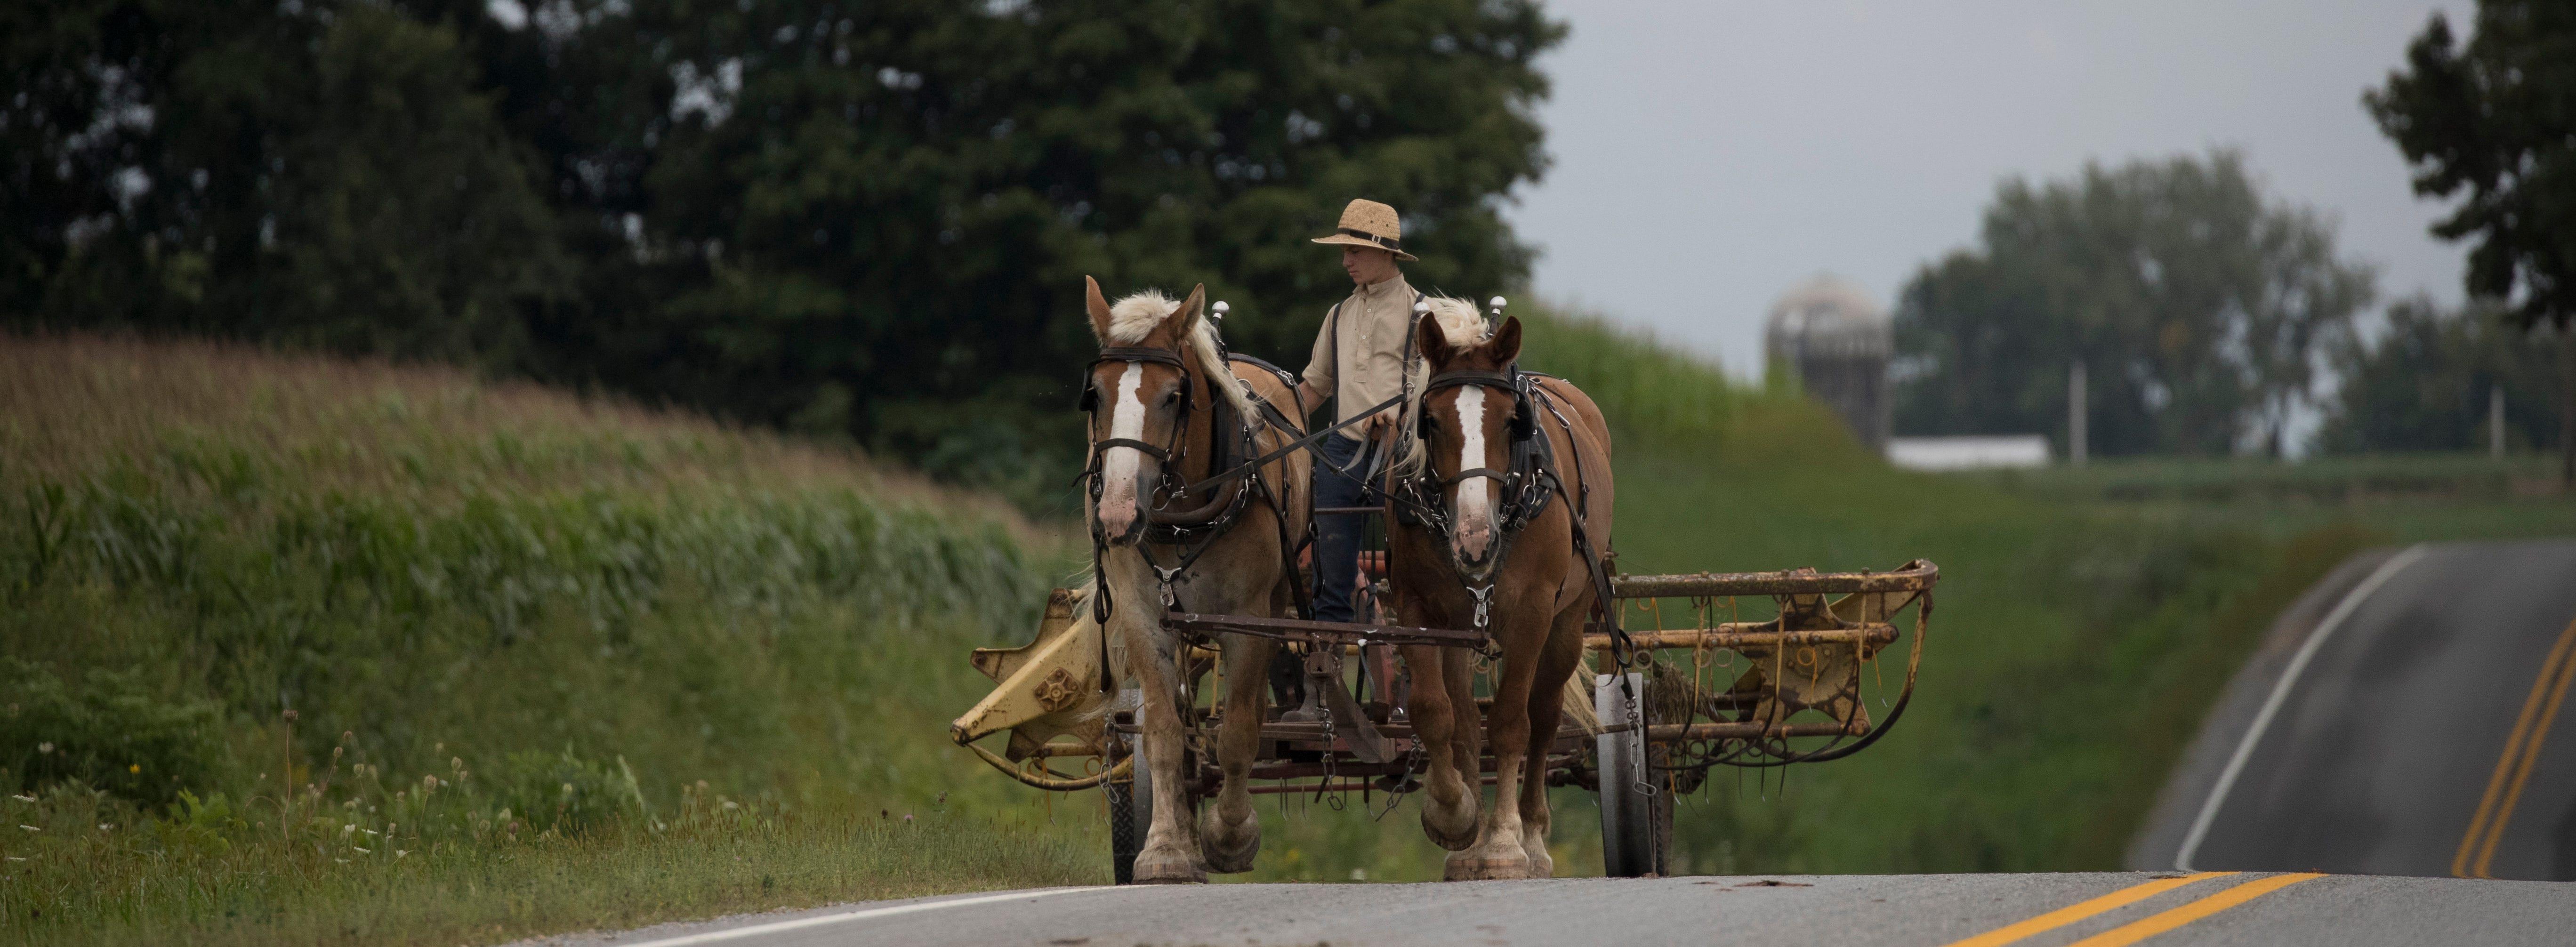 An Amish teen pulls farm machinery down a road in La Farge.